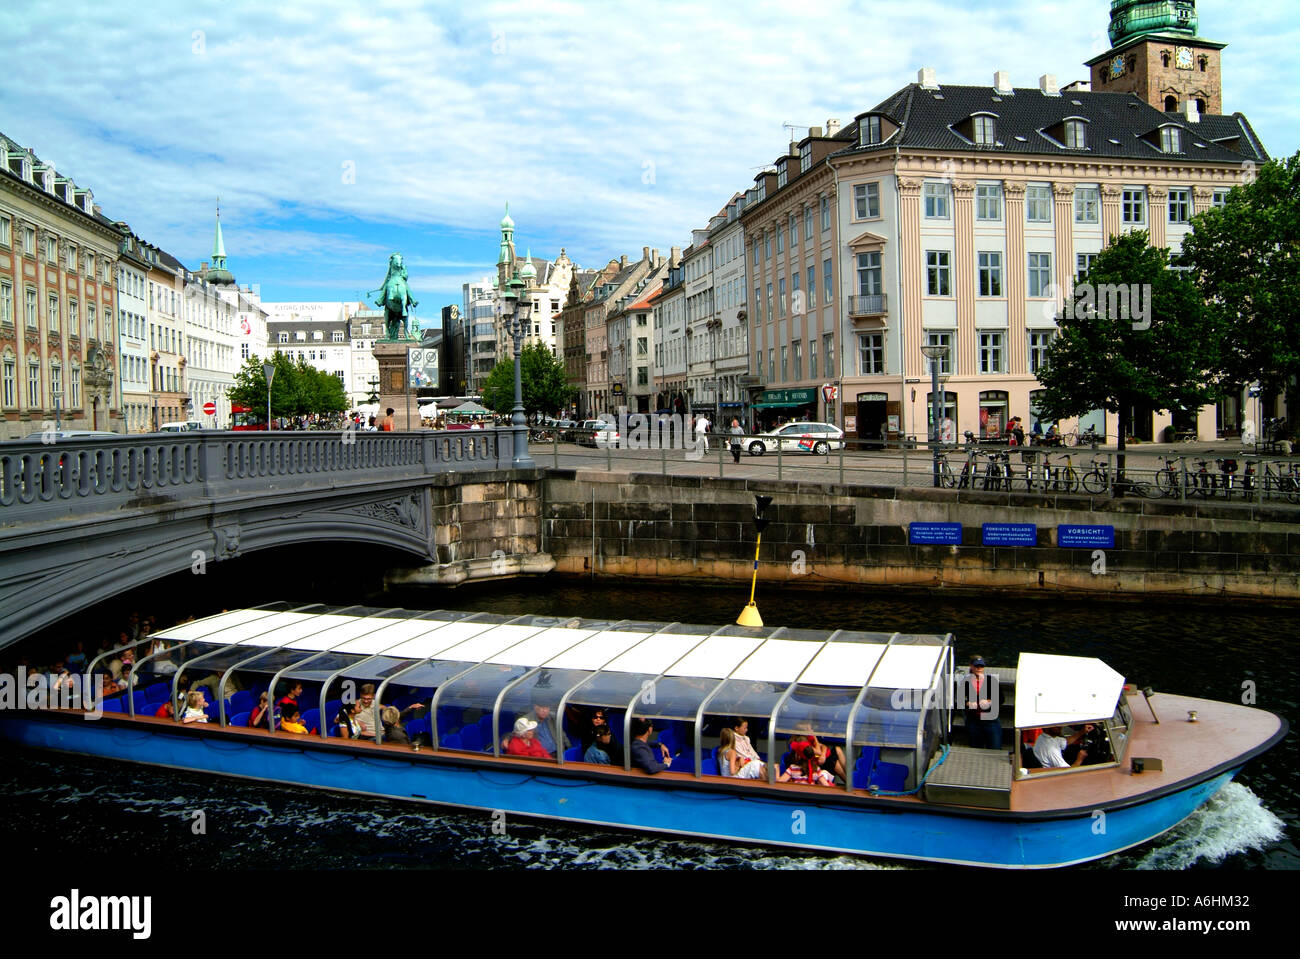 Tourist boat in Frederiksholms channel.Copenhagen.Denmark - Stock Image